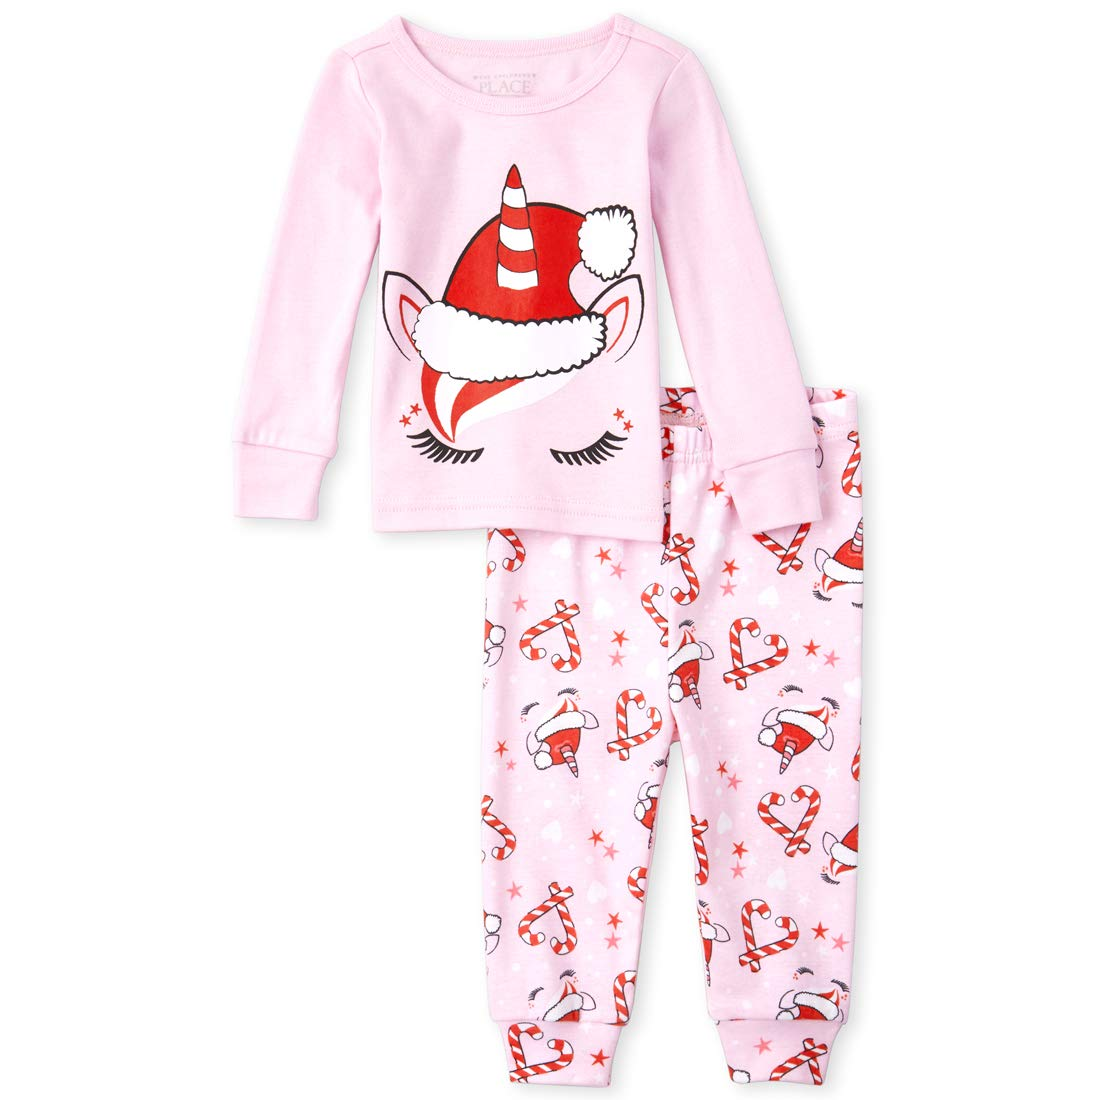 The Children's Place Baby Girls Pajama Set, Pink